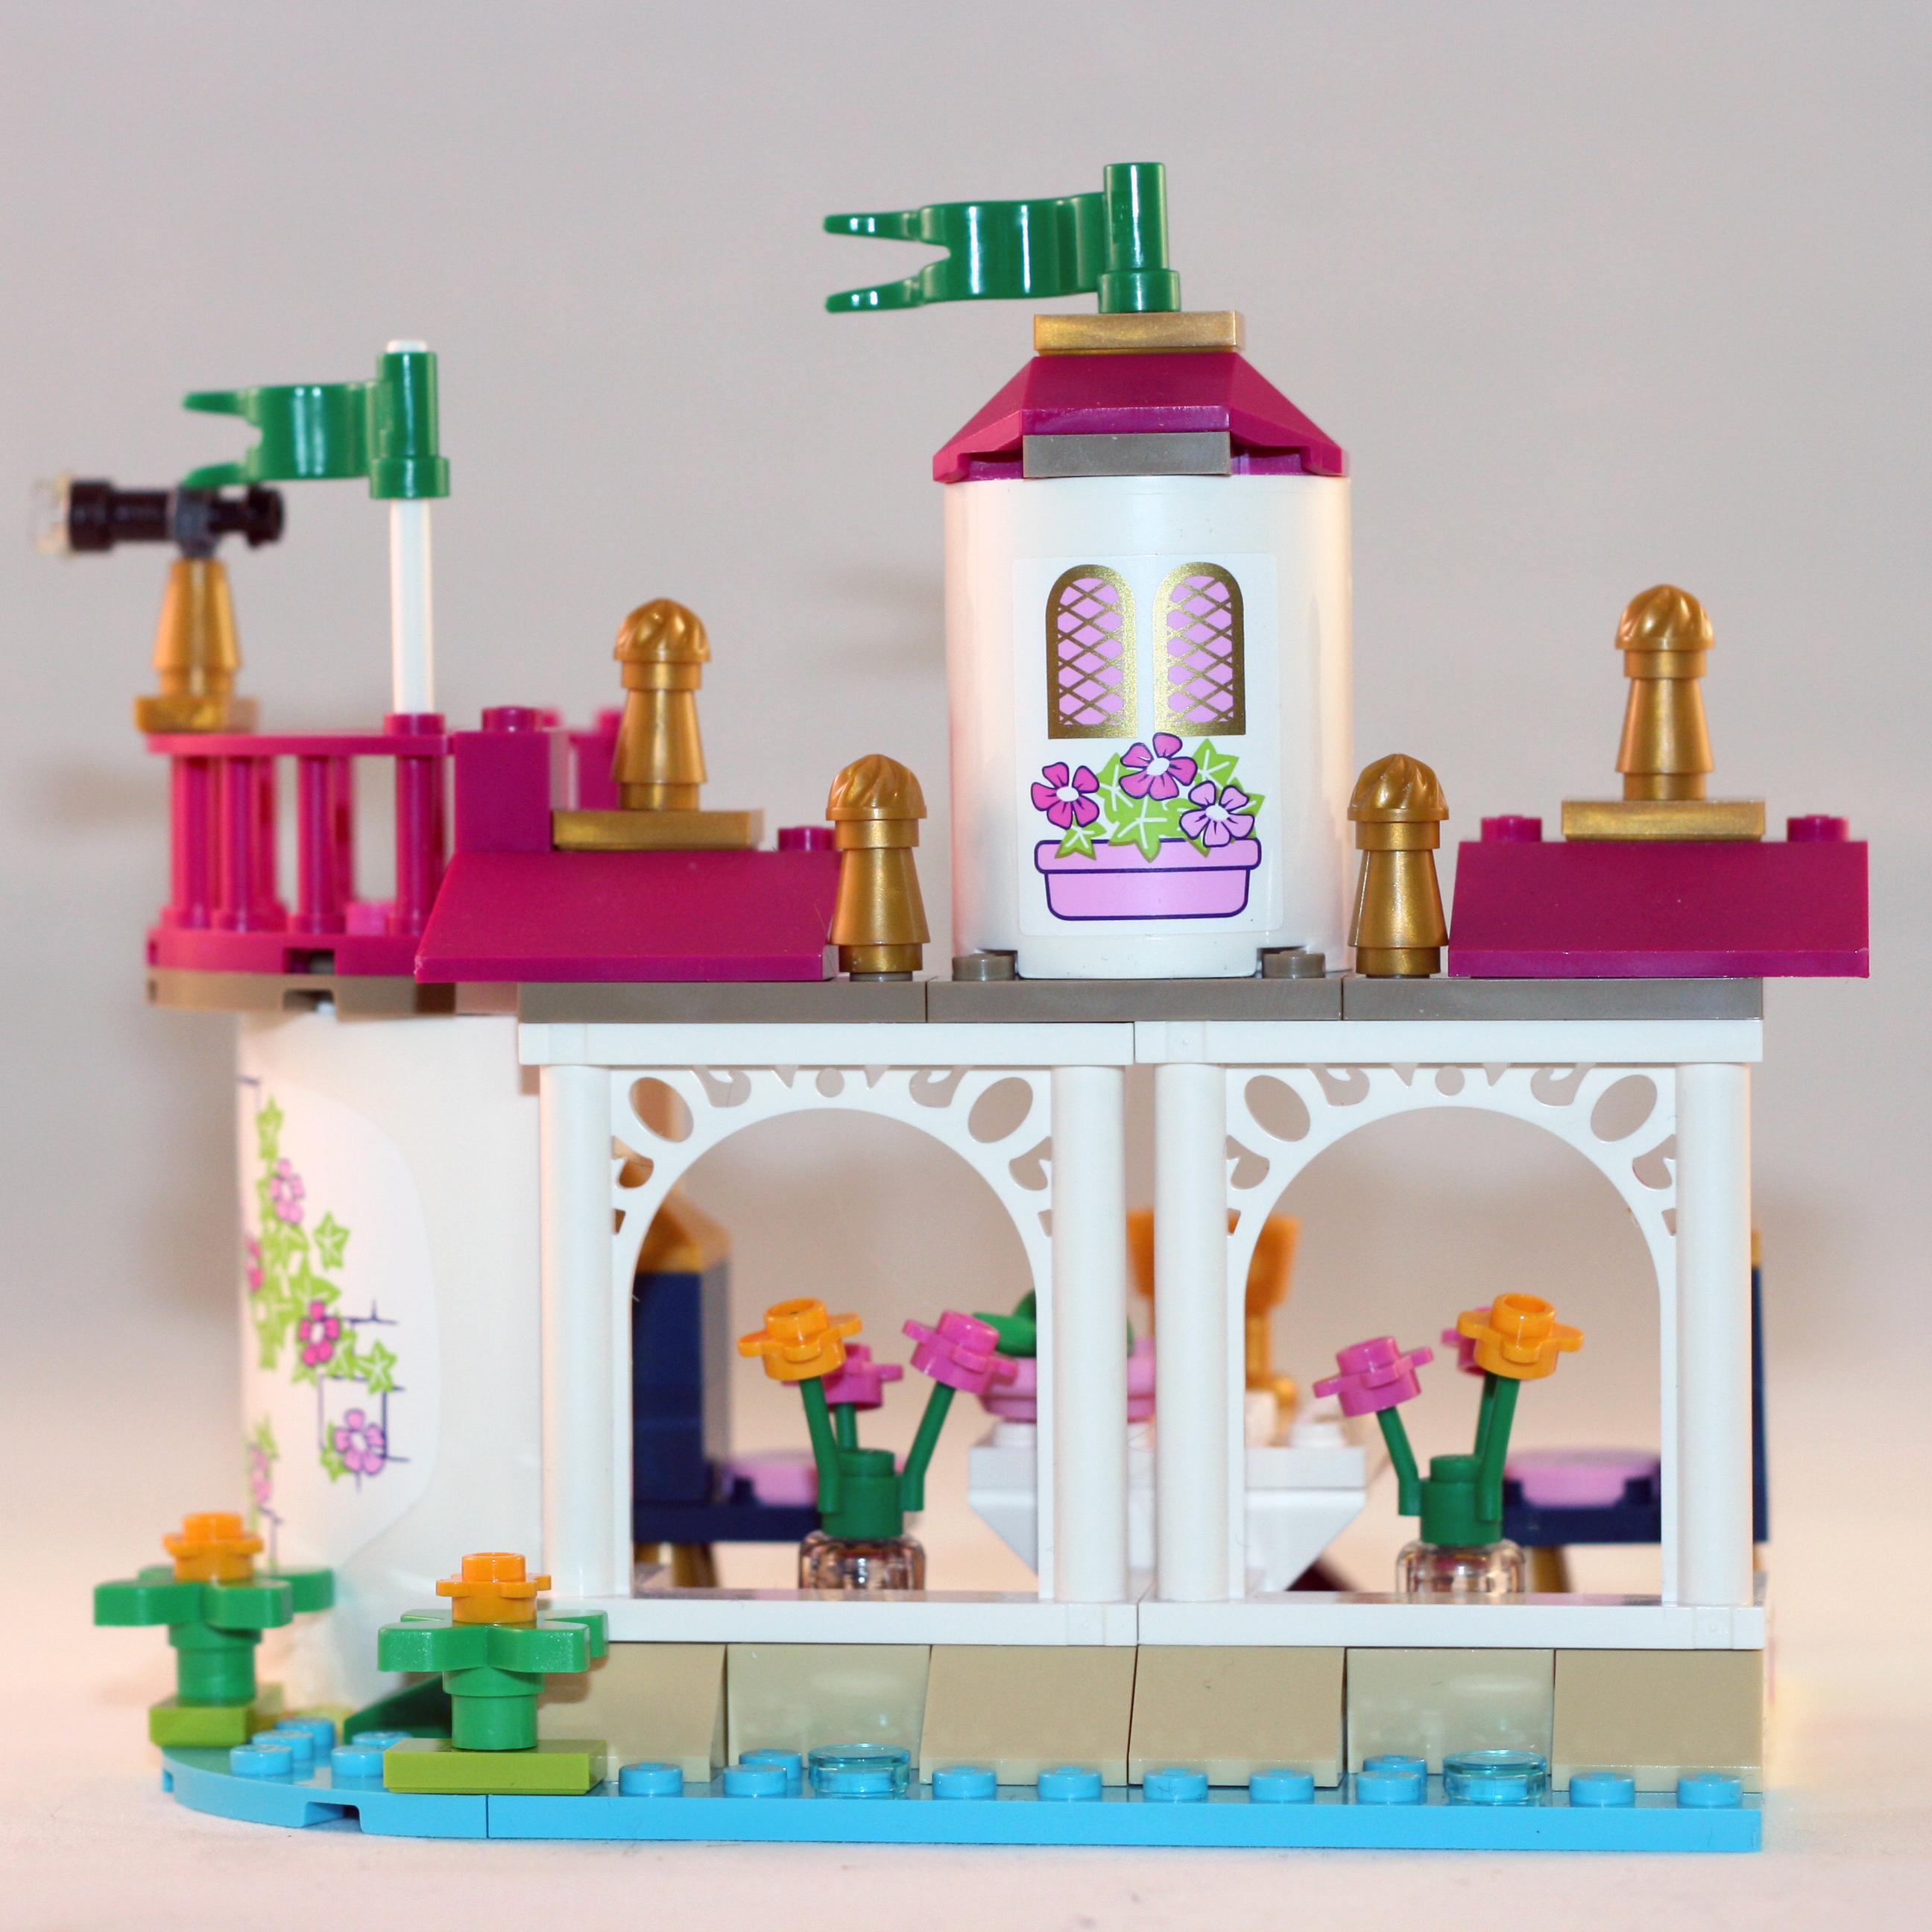 LEGO_Ariel_Building_1